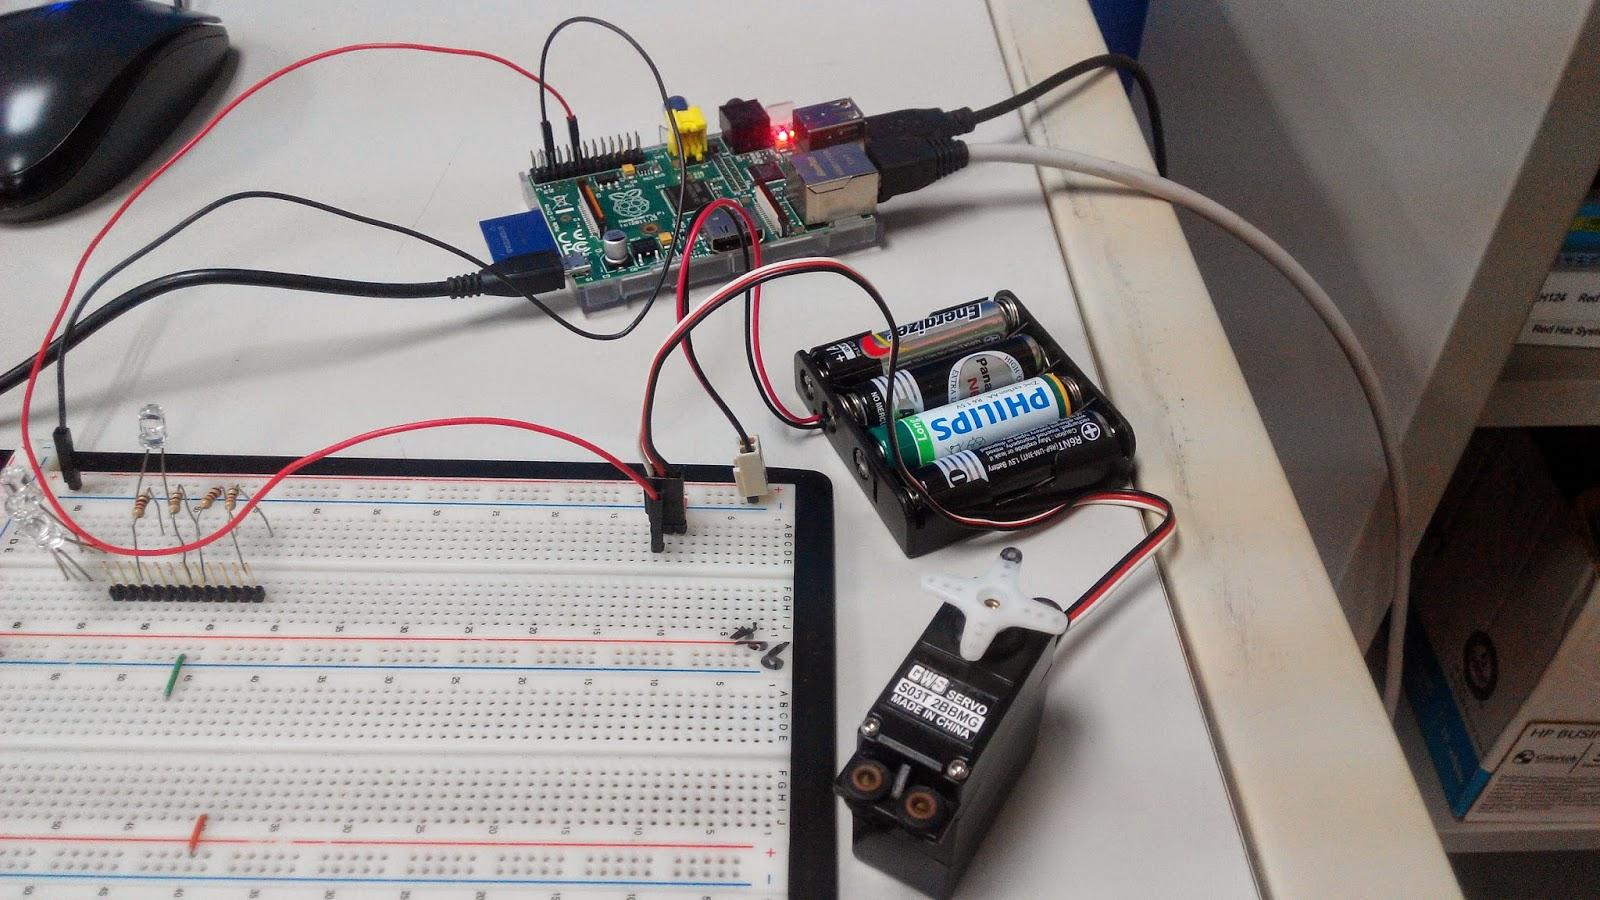 PM Linux 好好玩實驗室: Raspberry Pi GPIO (三) 控制伺服馬達